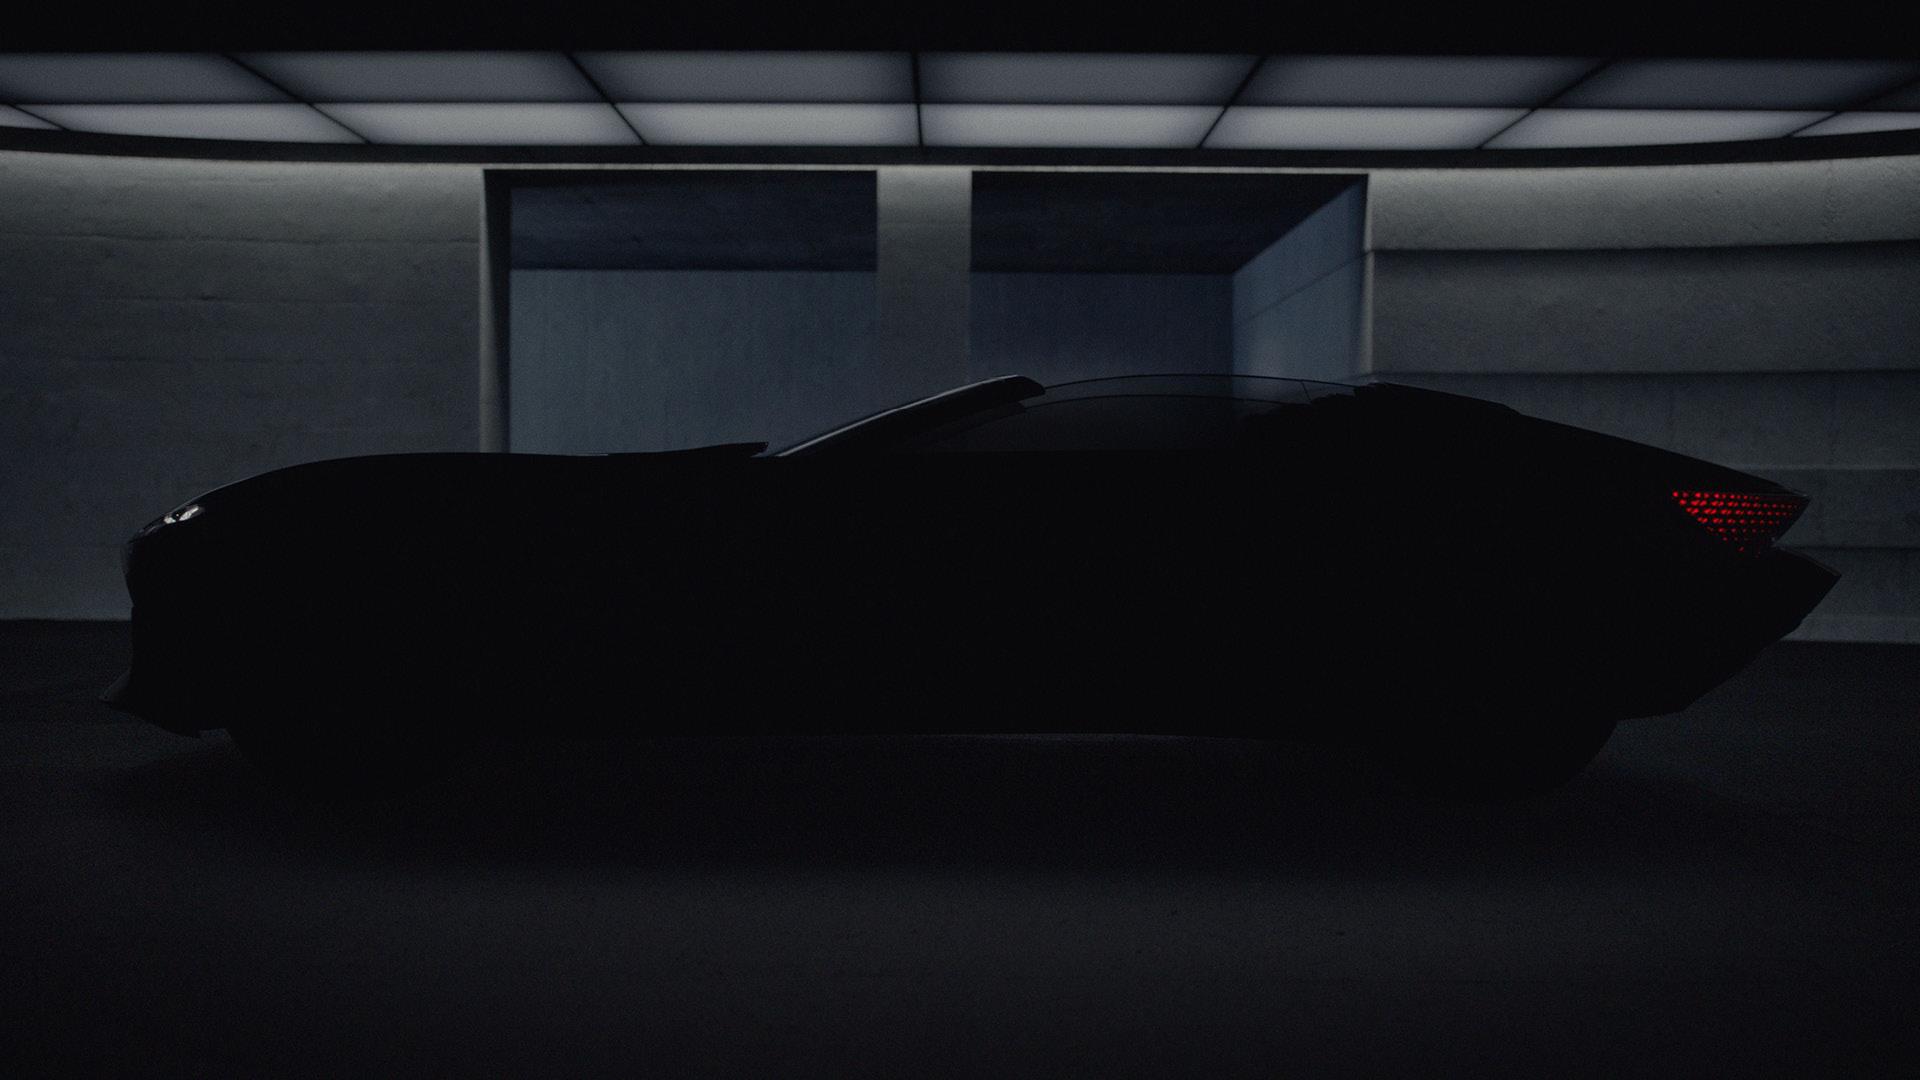 Audi объявил дату презентации электрического кабриолет-родстера Skysphere